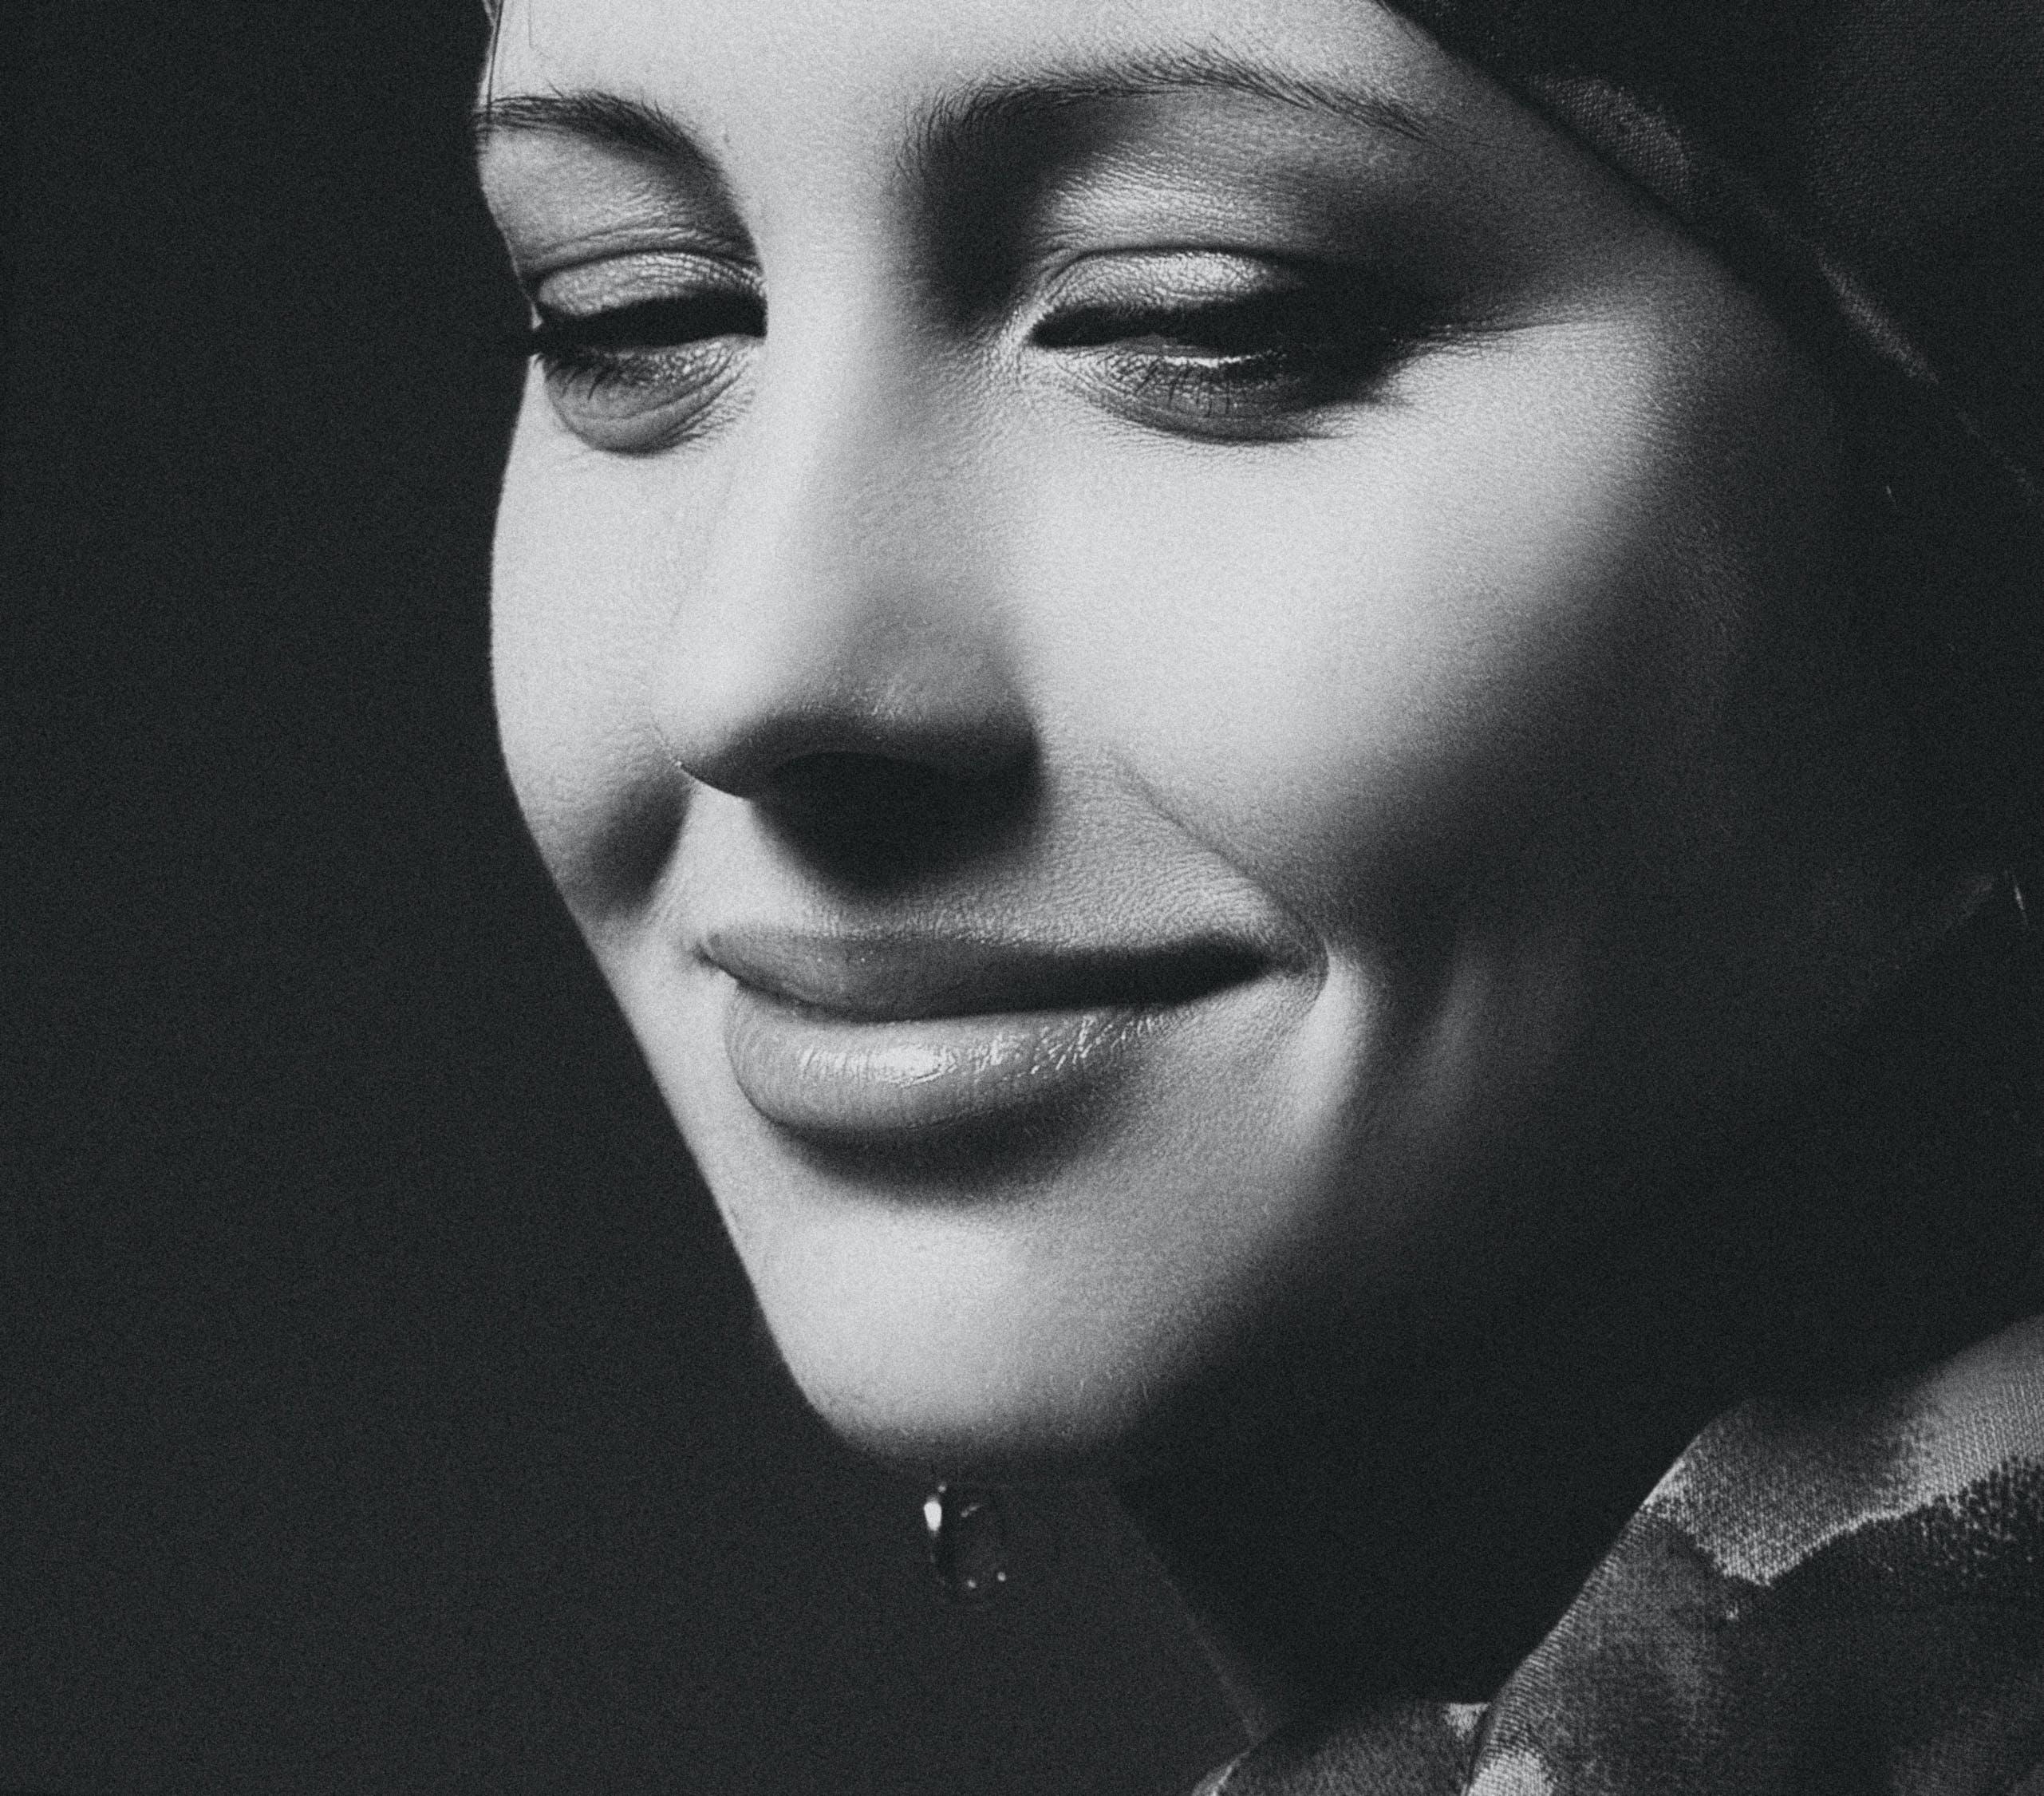 Free stock photo of девушка, портрет, студия, улыбка